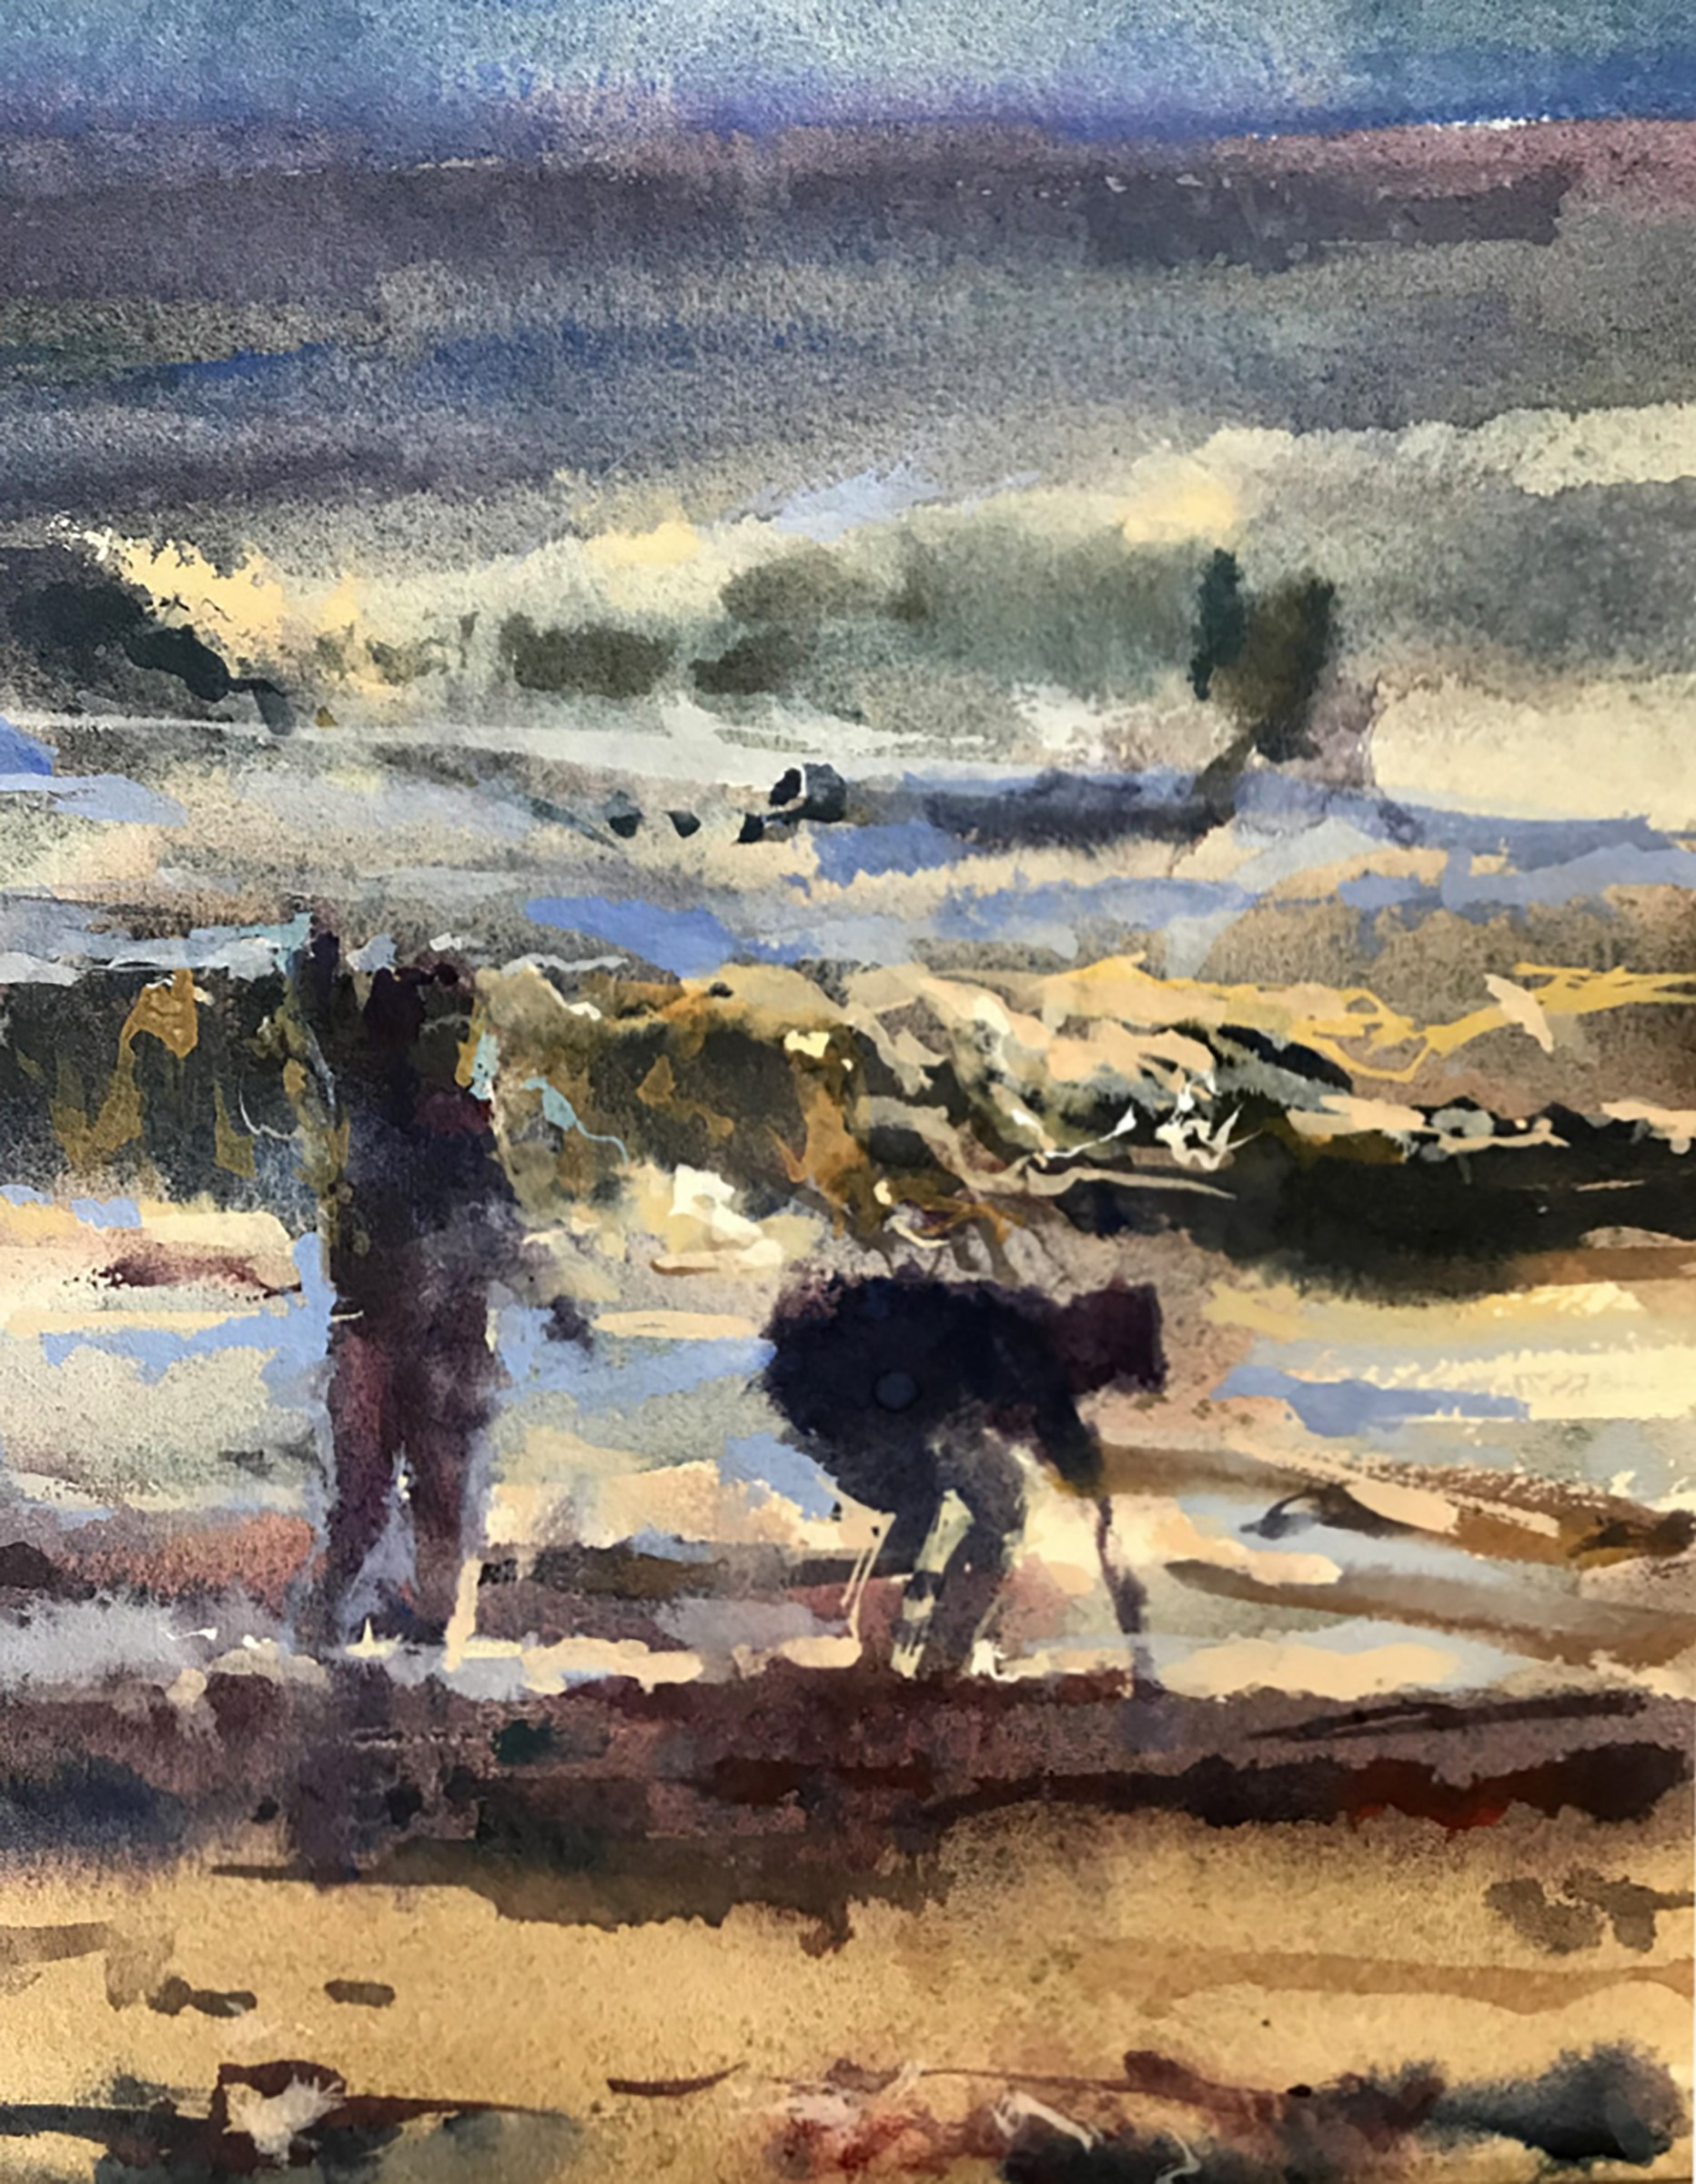 "<span class=""link fancybox-details-link""><a href=""/artists/46-francis-bowyer/works/12689-francis-bowyer-beach-fun/"">View Detail Page</a></span><div class=""artist""><span class=""artist""><strong>Francis Bowyer</strong></span></div><div class=""title""><em>Beach Fun</em></div><div class=""medium"">watercolour & bodycolour</div><div class=""dimensions"">Artwork: 25 x 25cm</div><div class=""price"">£750.00</div>"